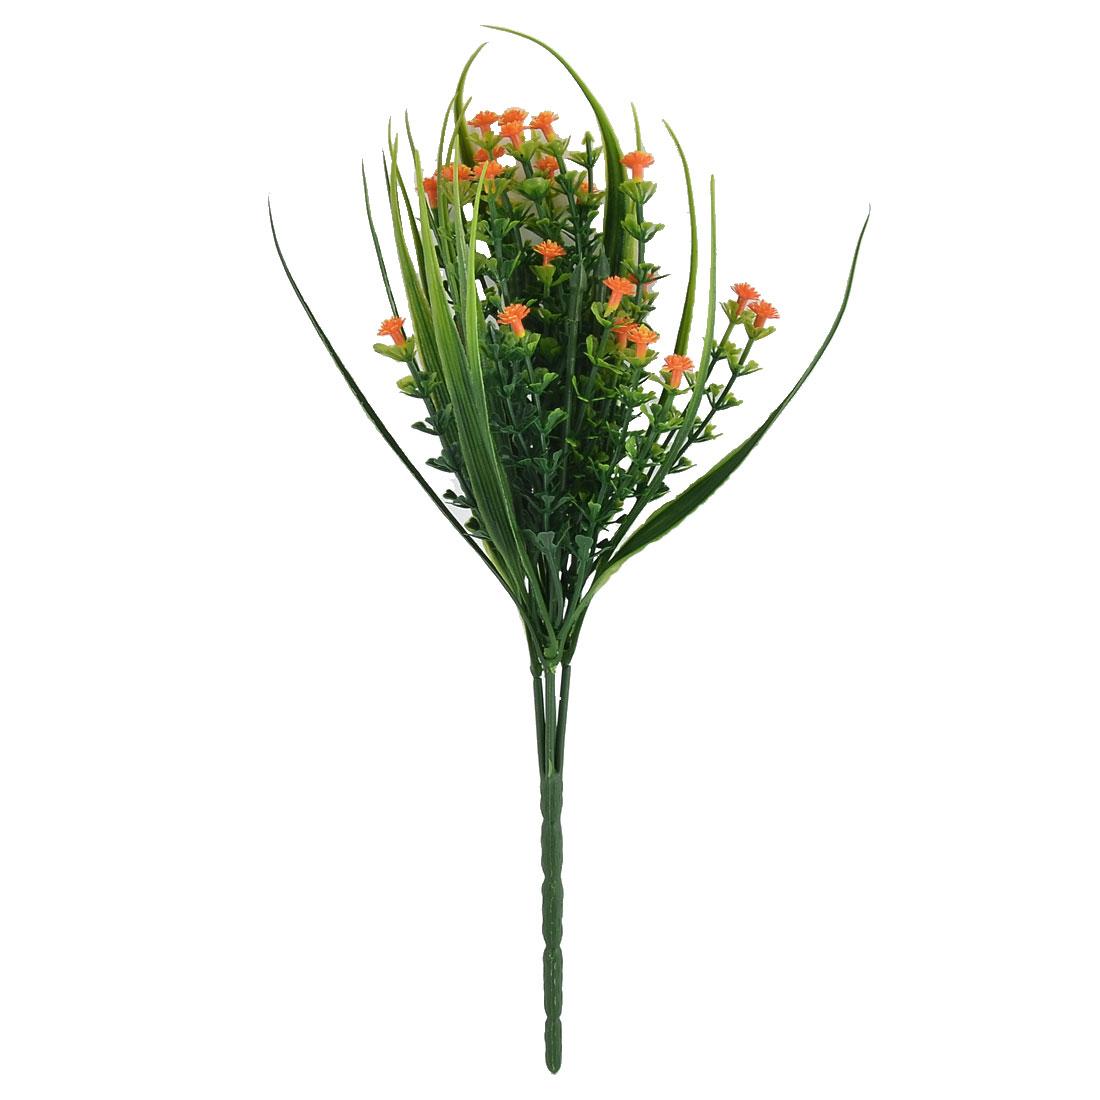 Weeding Restaurant Decorating Slender Flower Blossom Artificial Bouquet Orange